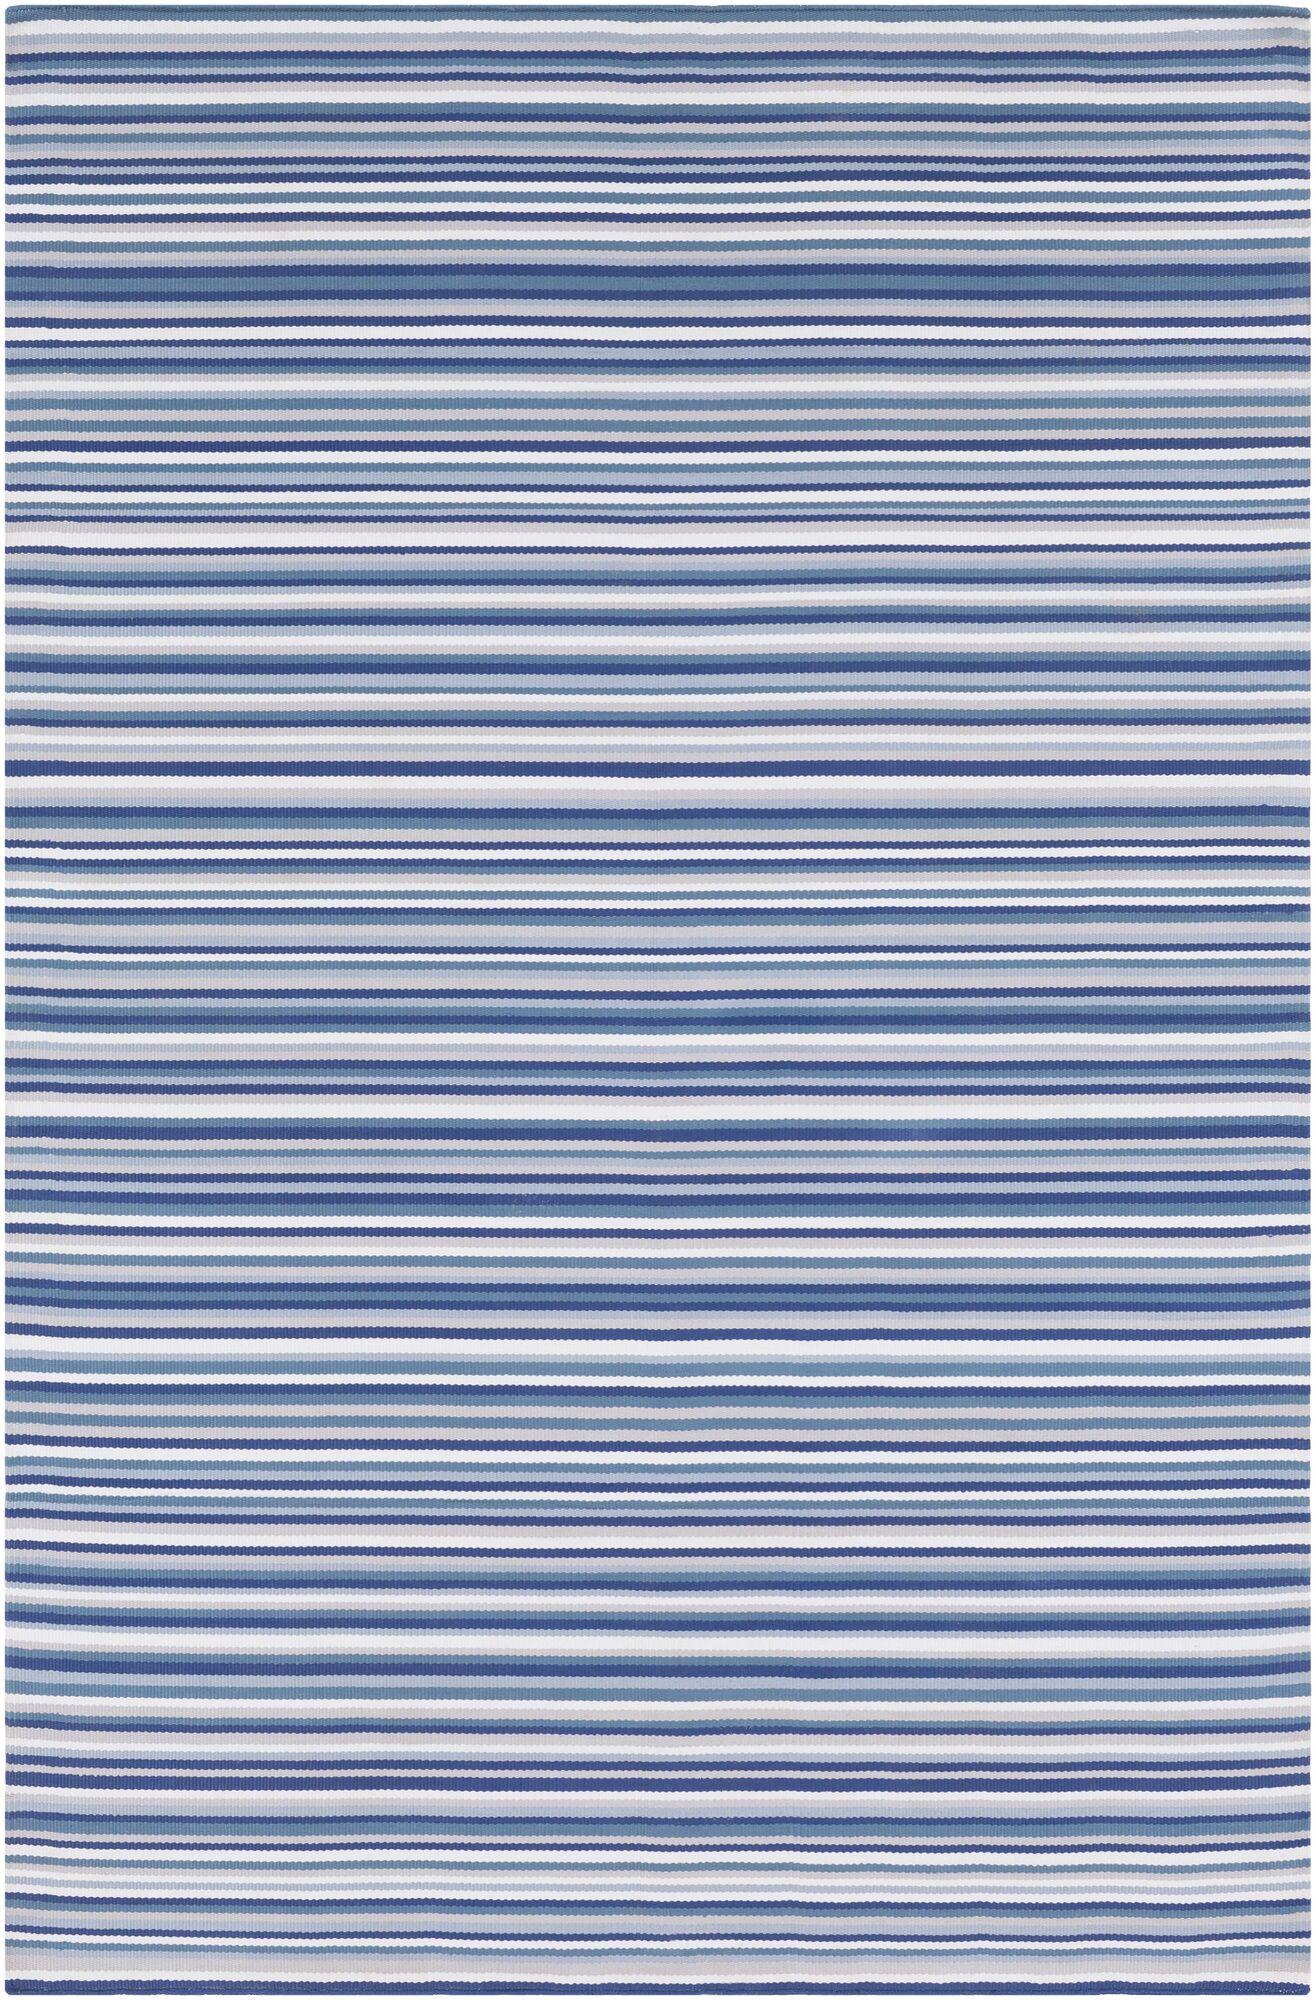 Bybrook Hand Woven Dark Blue Area Rug Rug Size: 8' x 10'